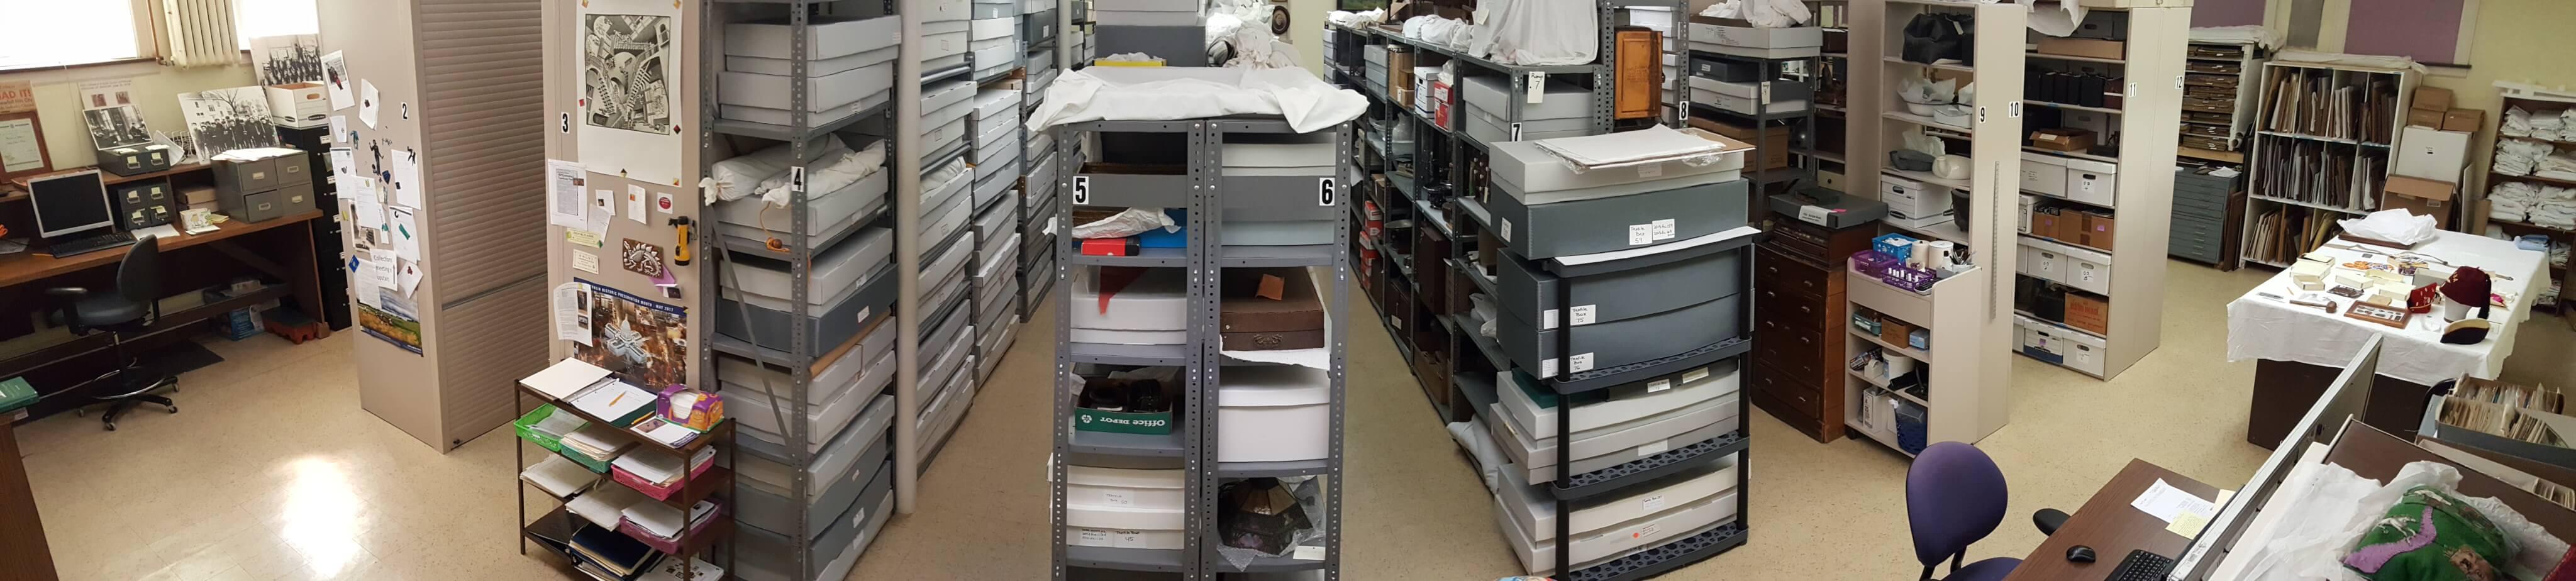 La Crosse Historical Society Archives